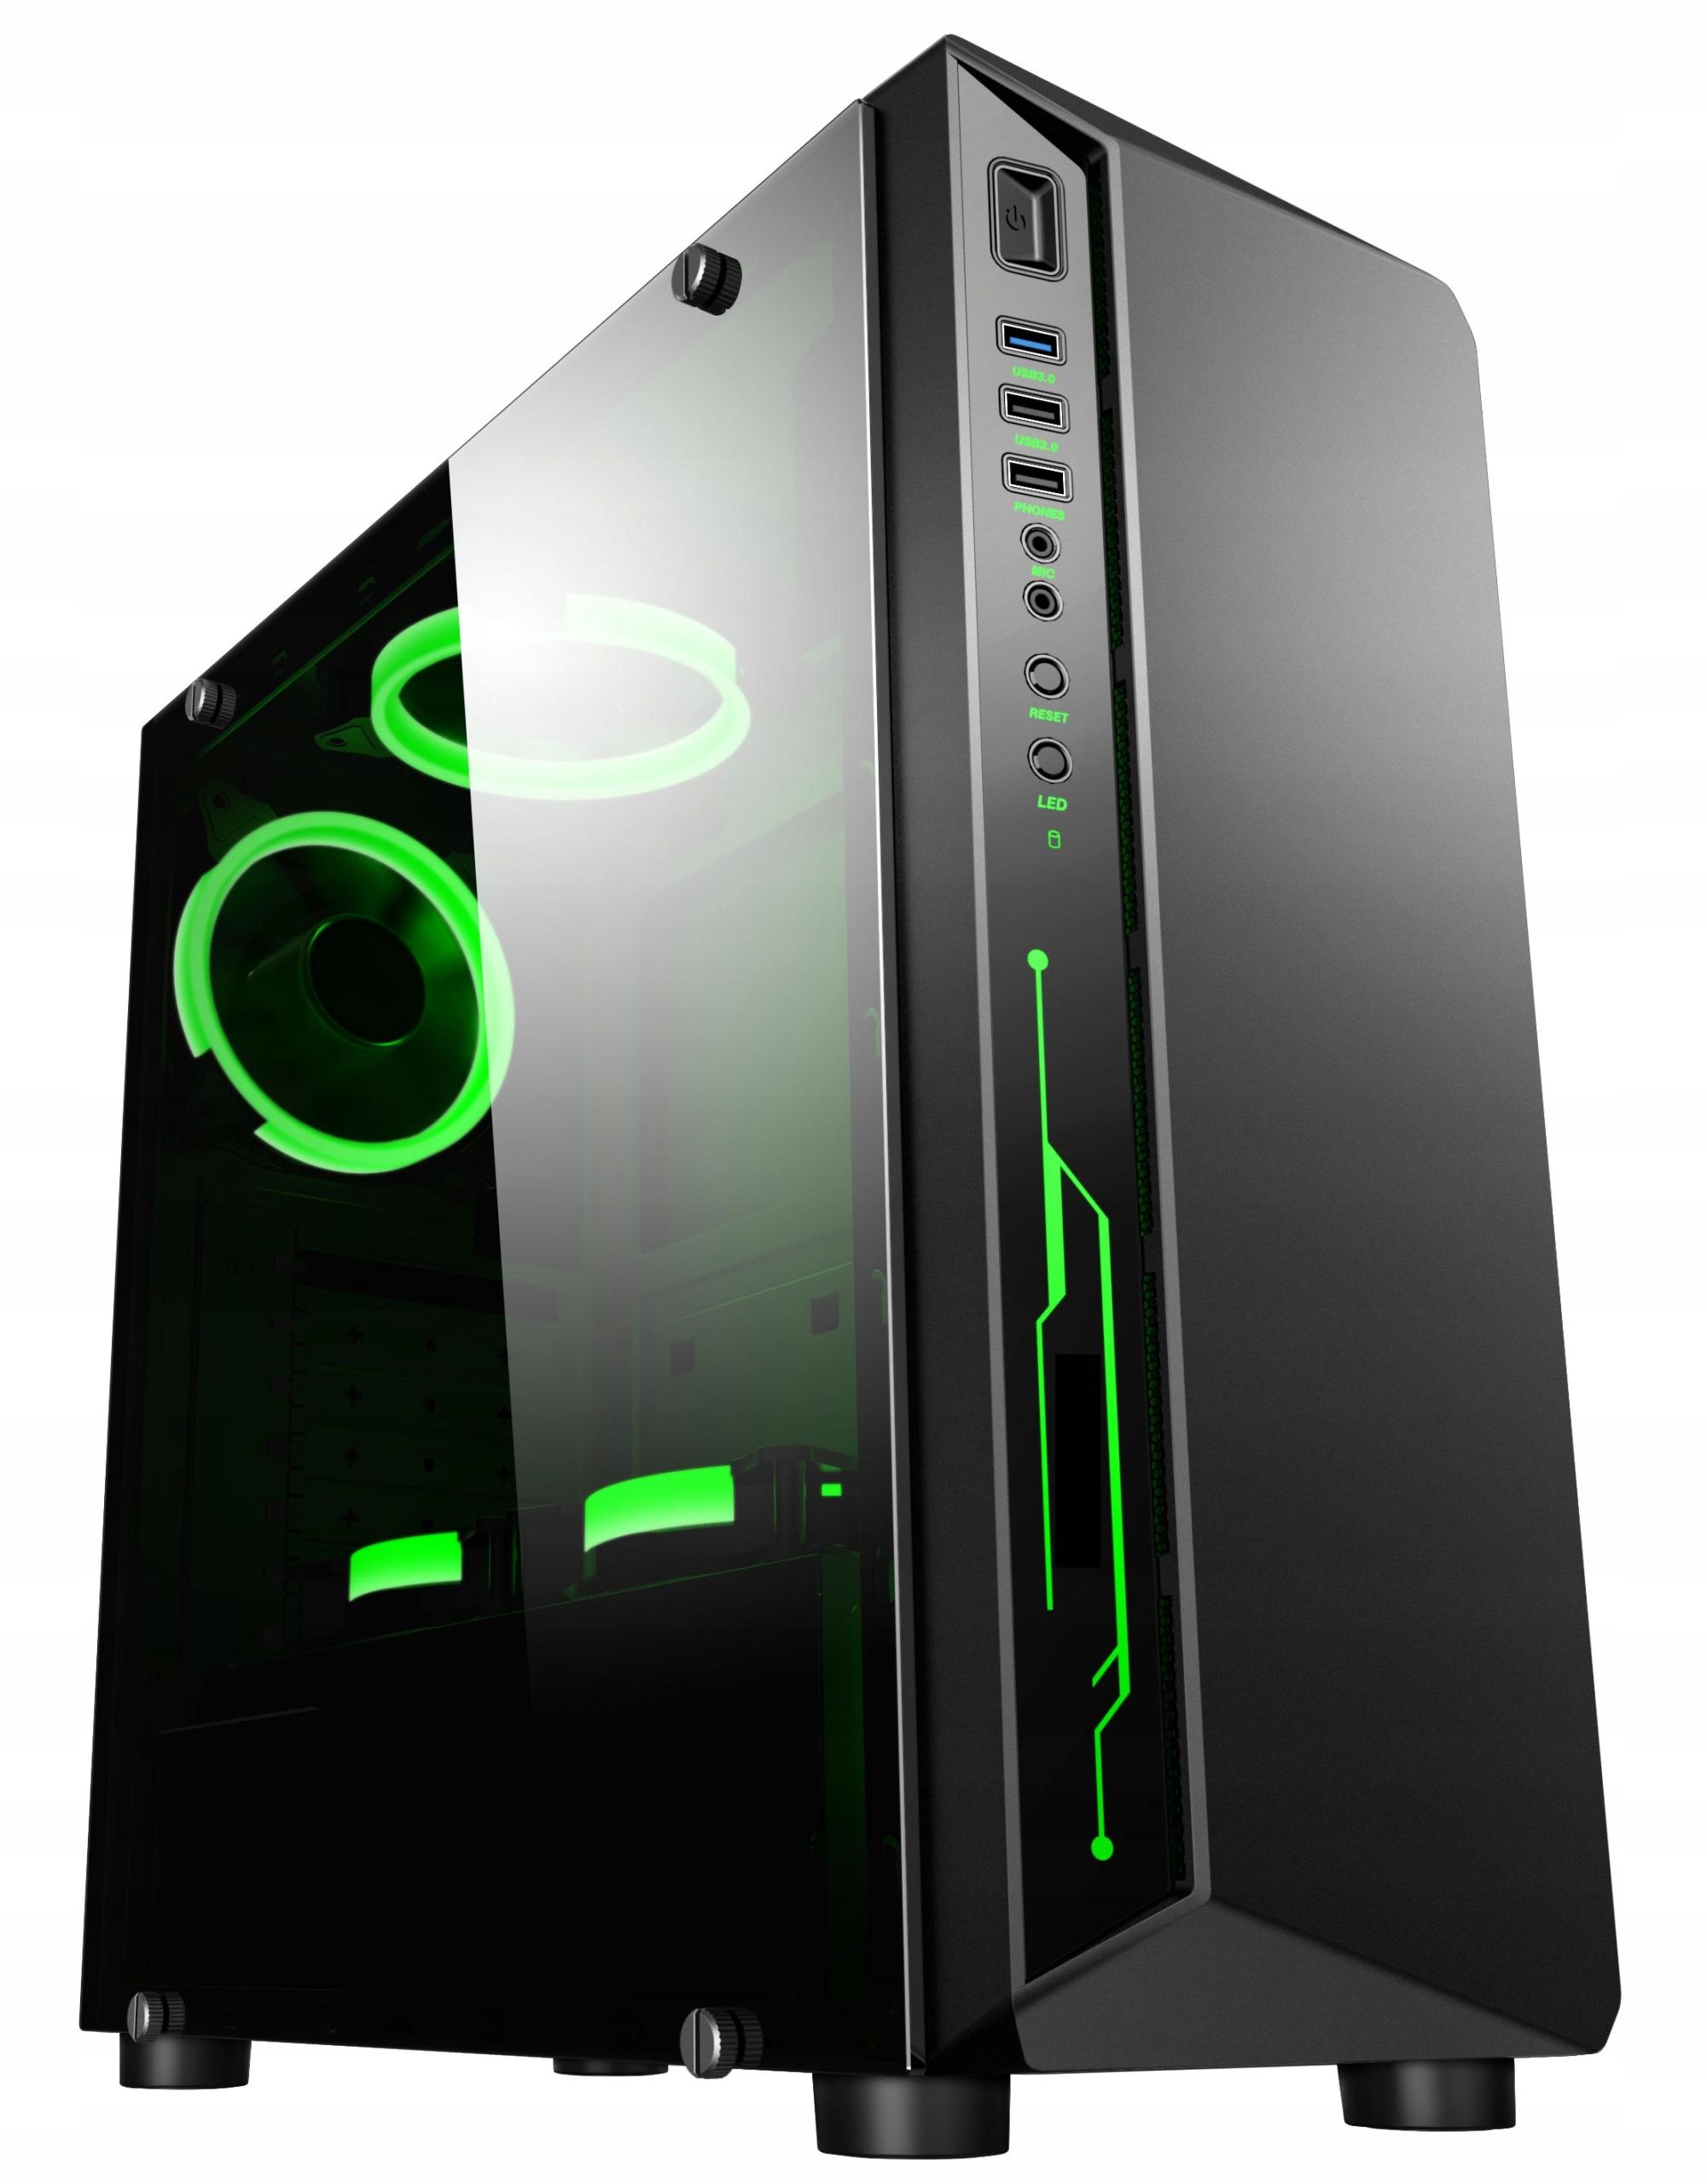 OBUDOWA Gamer Premium model BPC3 USB 3.0, RGB LED